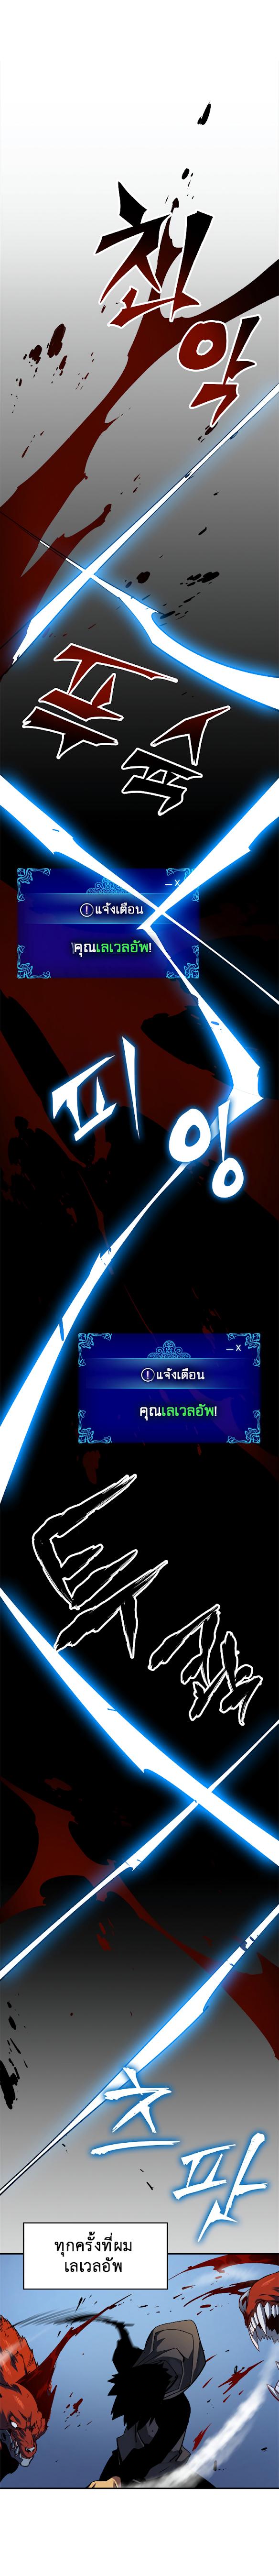 Solo Leveling ตอนที่ 15 TH แปลไทย